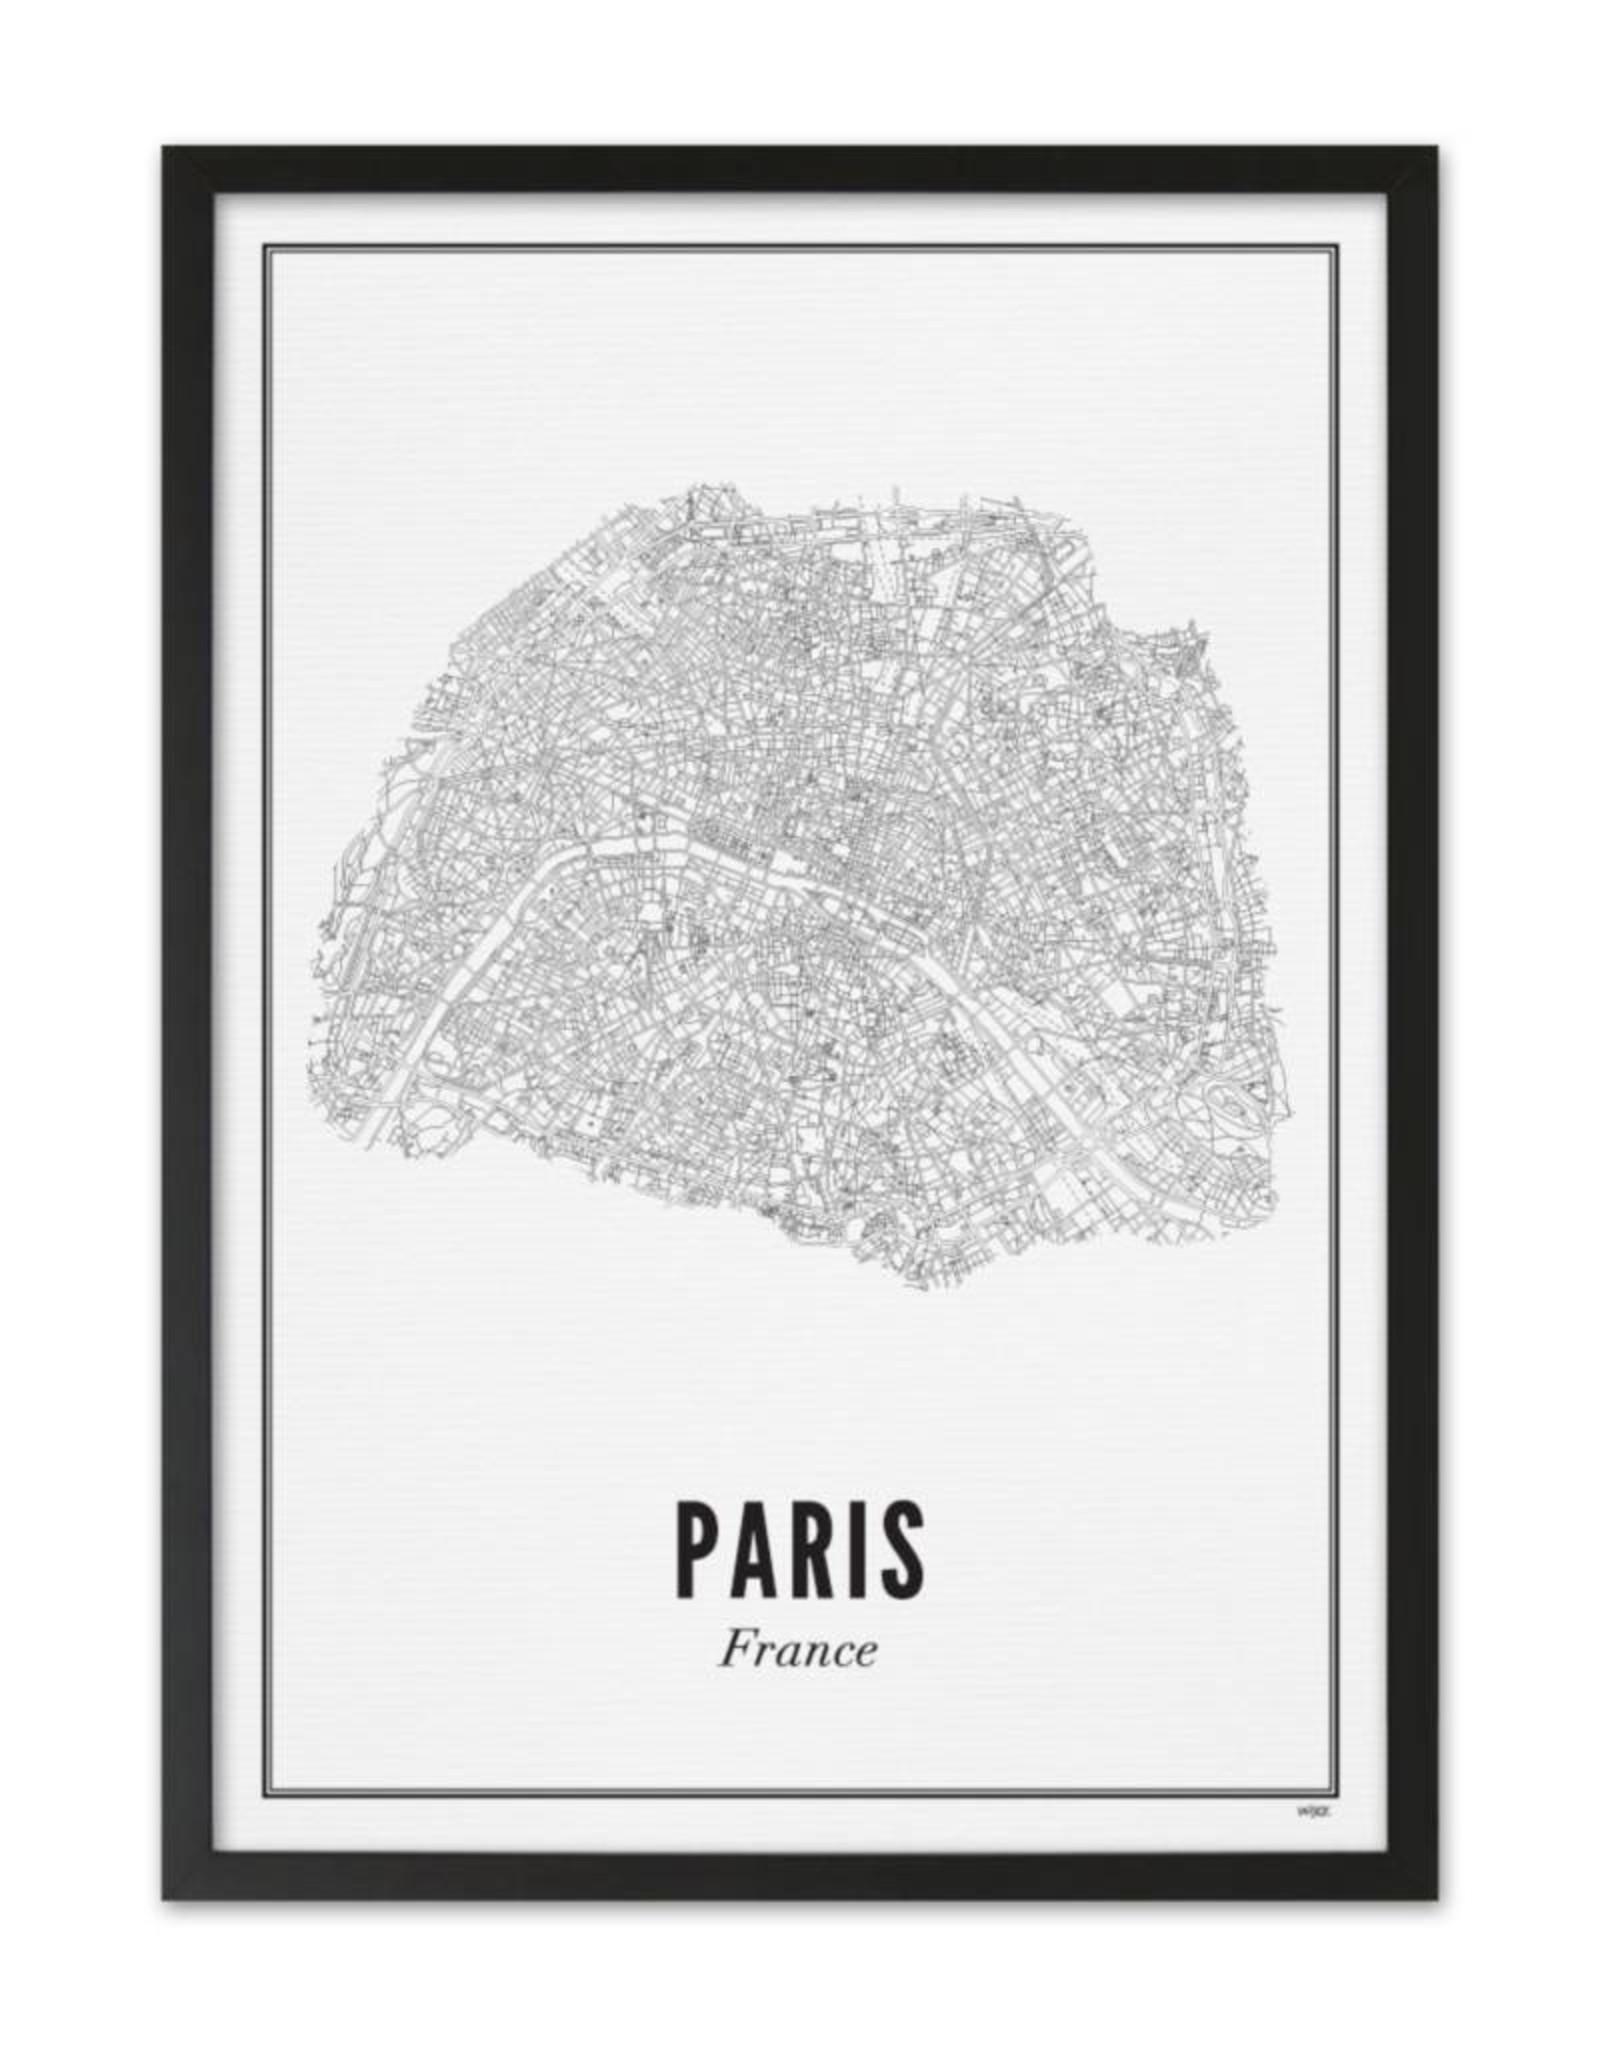 Wijck Wijck - prints - 30x40 - Paris city